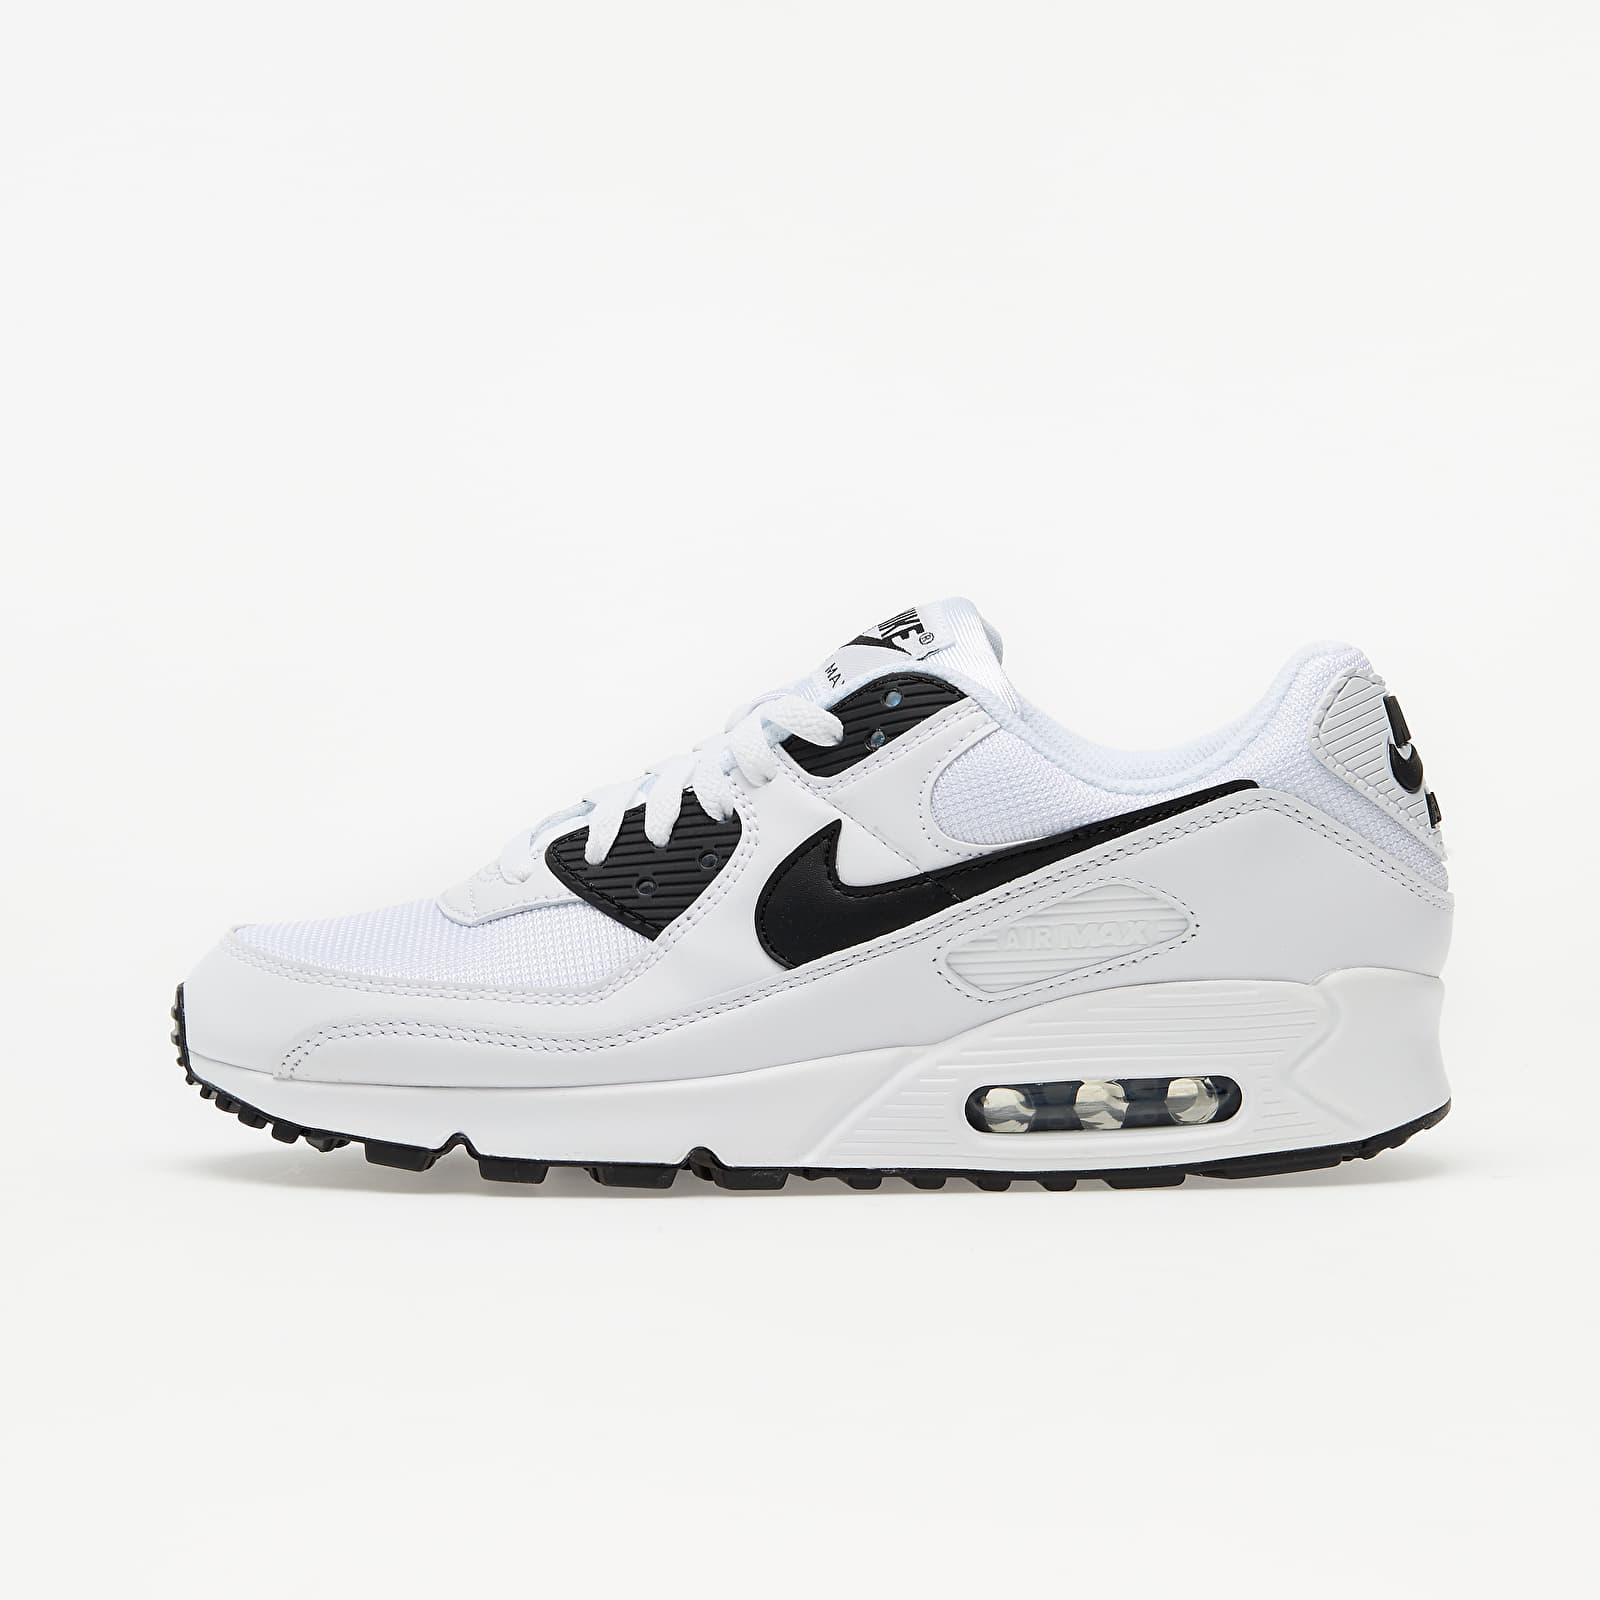 Nike Air Max 90 White/ Black-White CT1028-103